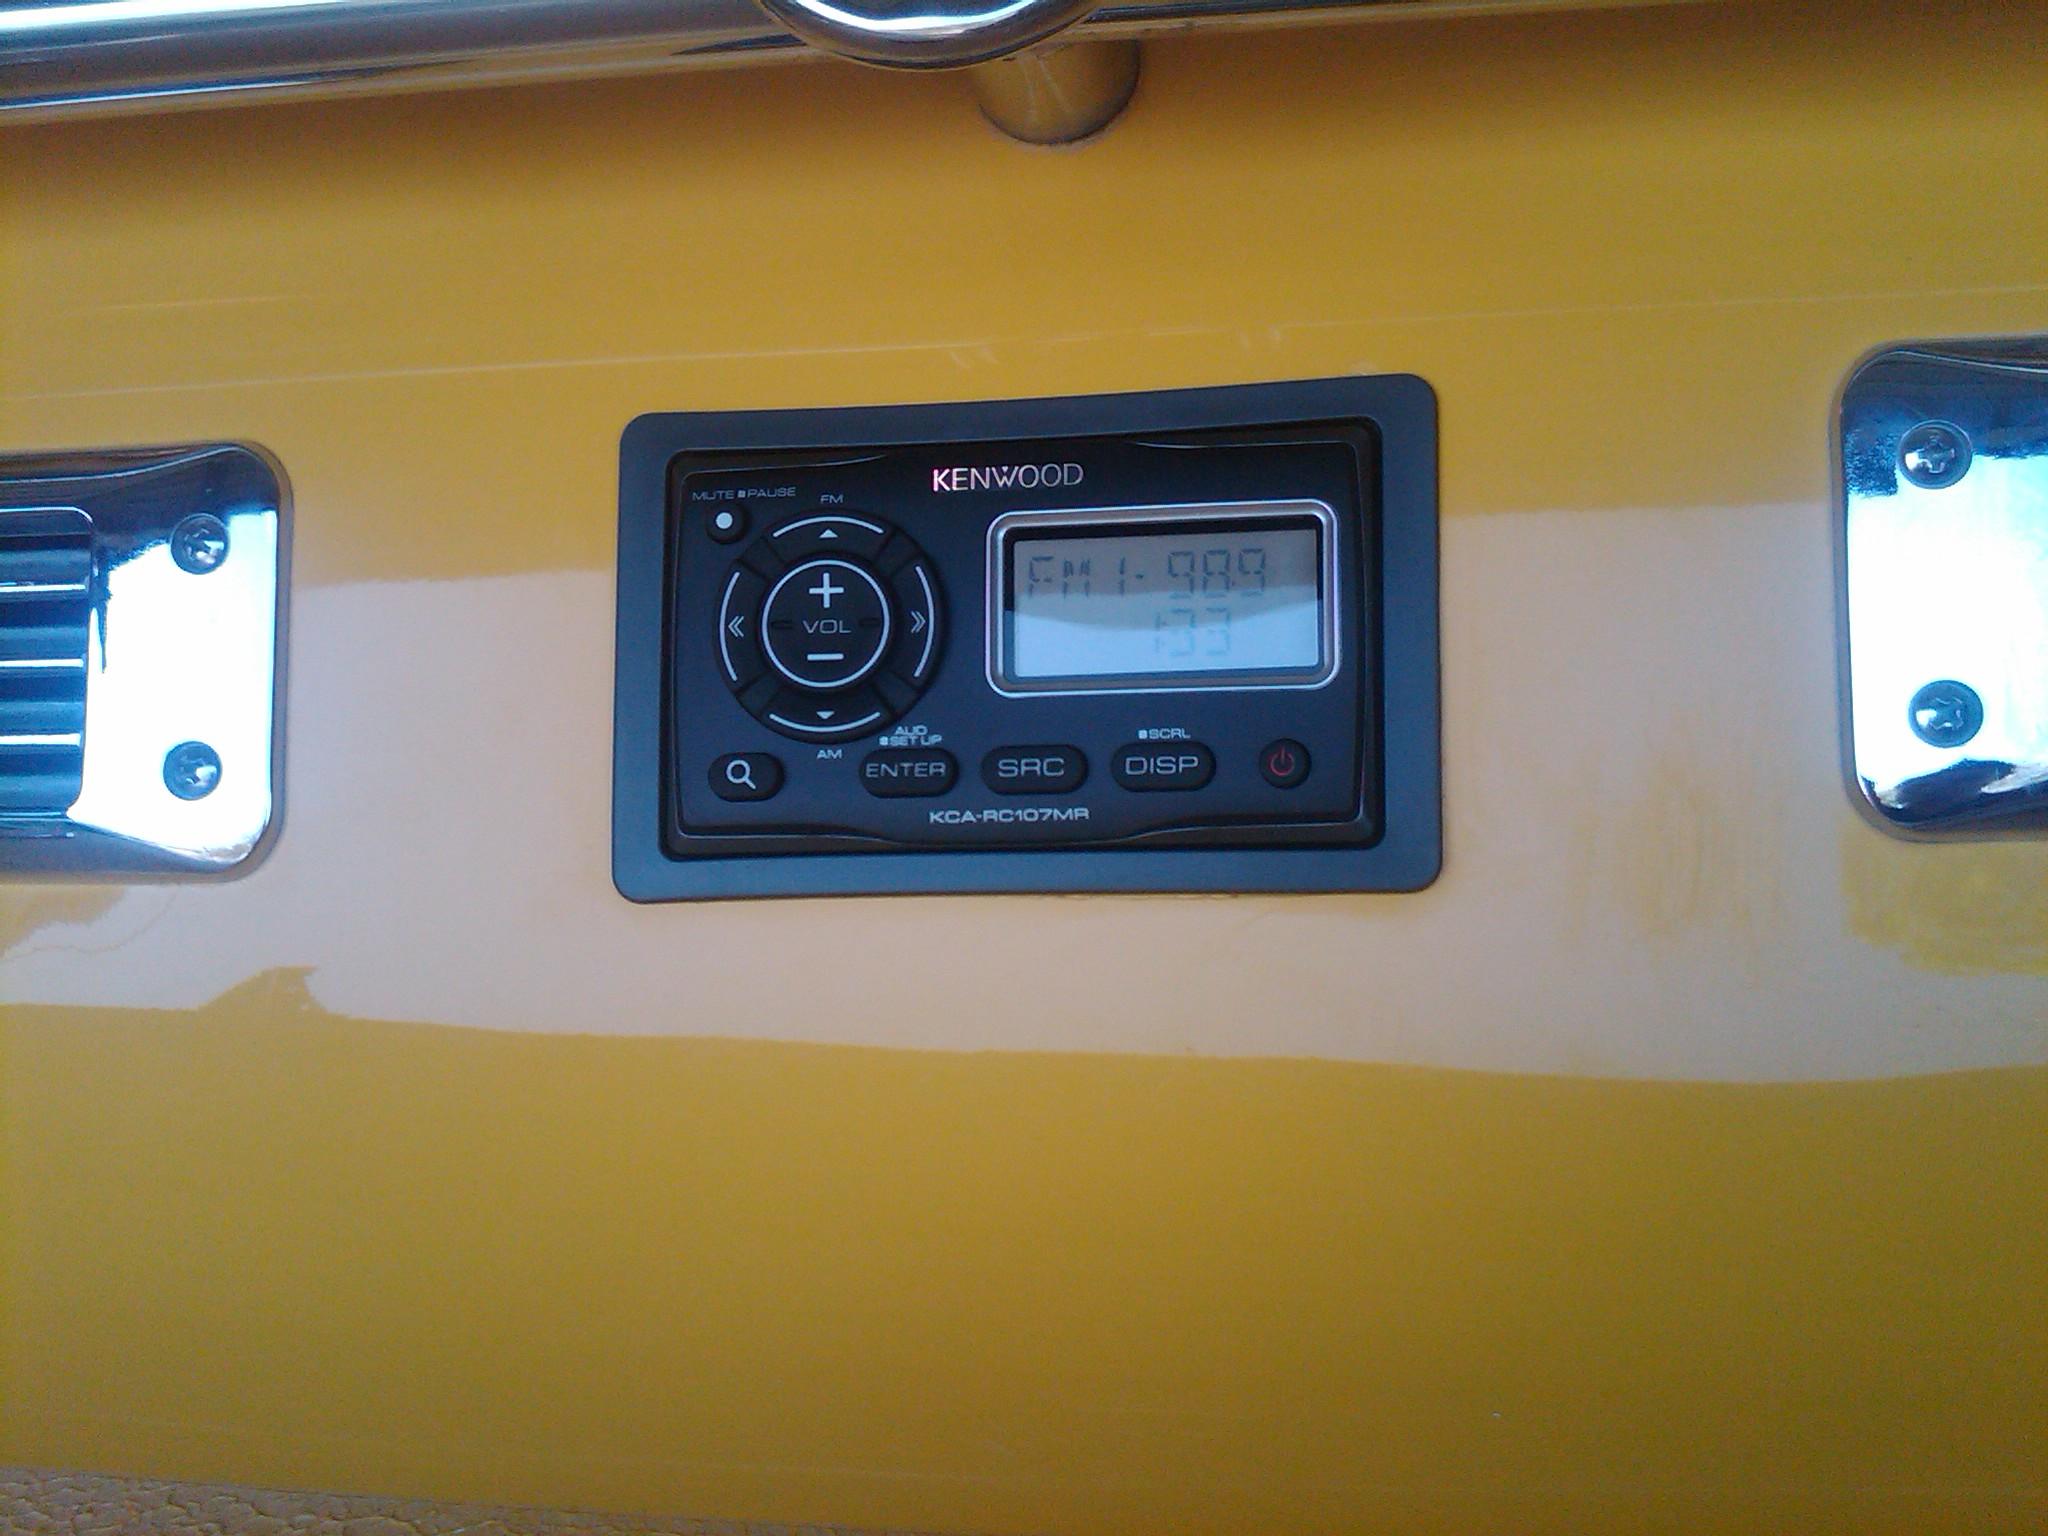 2008 Crownline 225 BR Kicker Powersports Marine Transom Speakers Kenwood Marine KMR Commander Head Unit Transom Remote